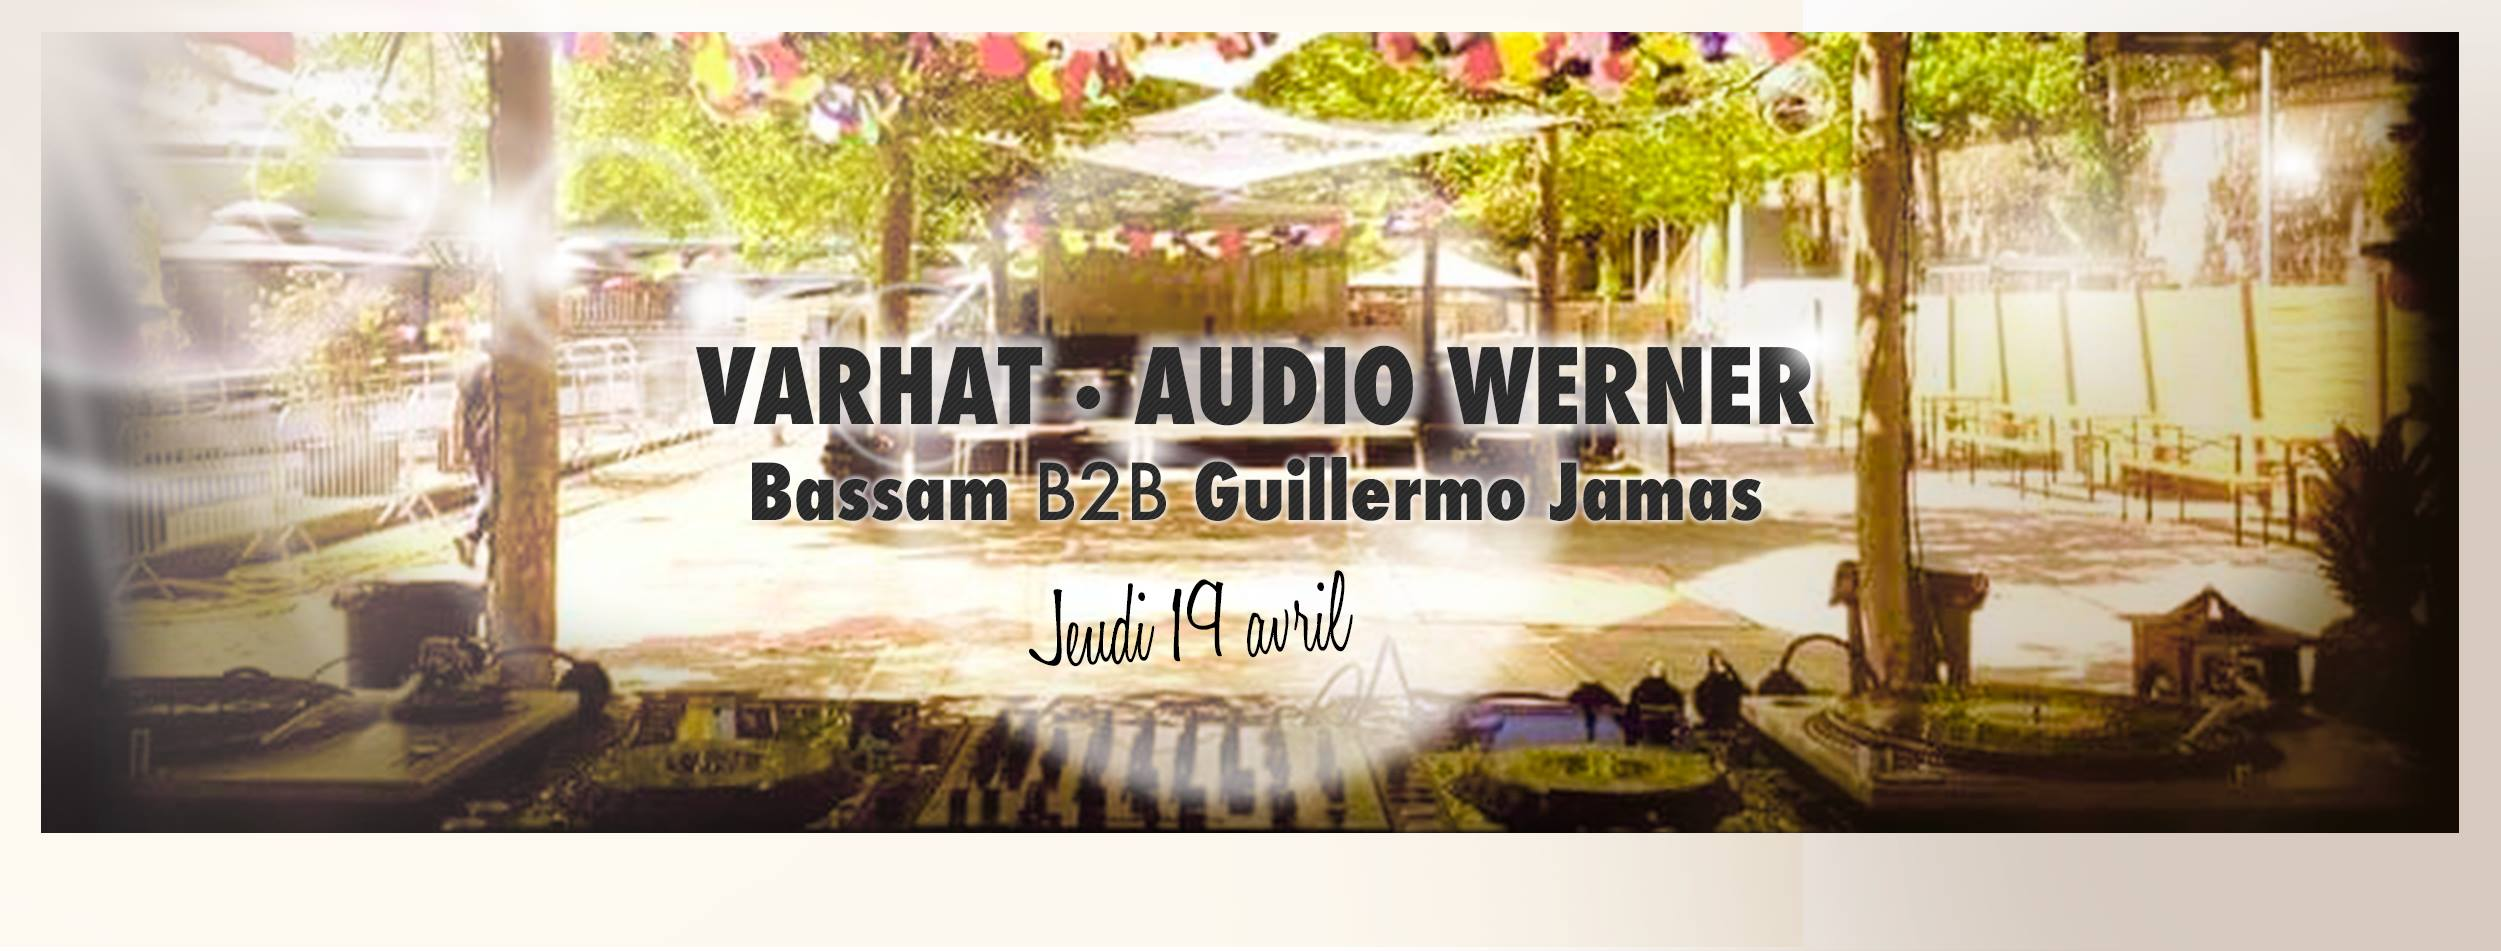 Les Barges Opening: Varhat - Audio Werner - Bassam B2b Guillermo Jamas